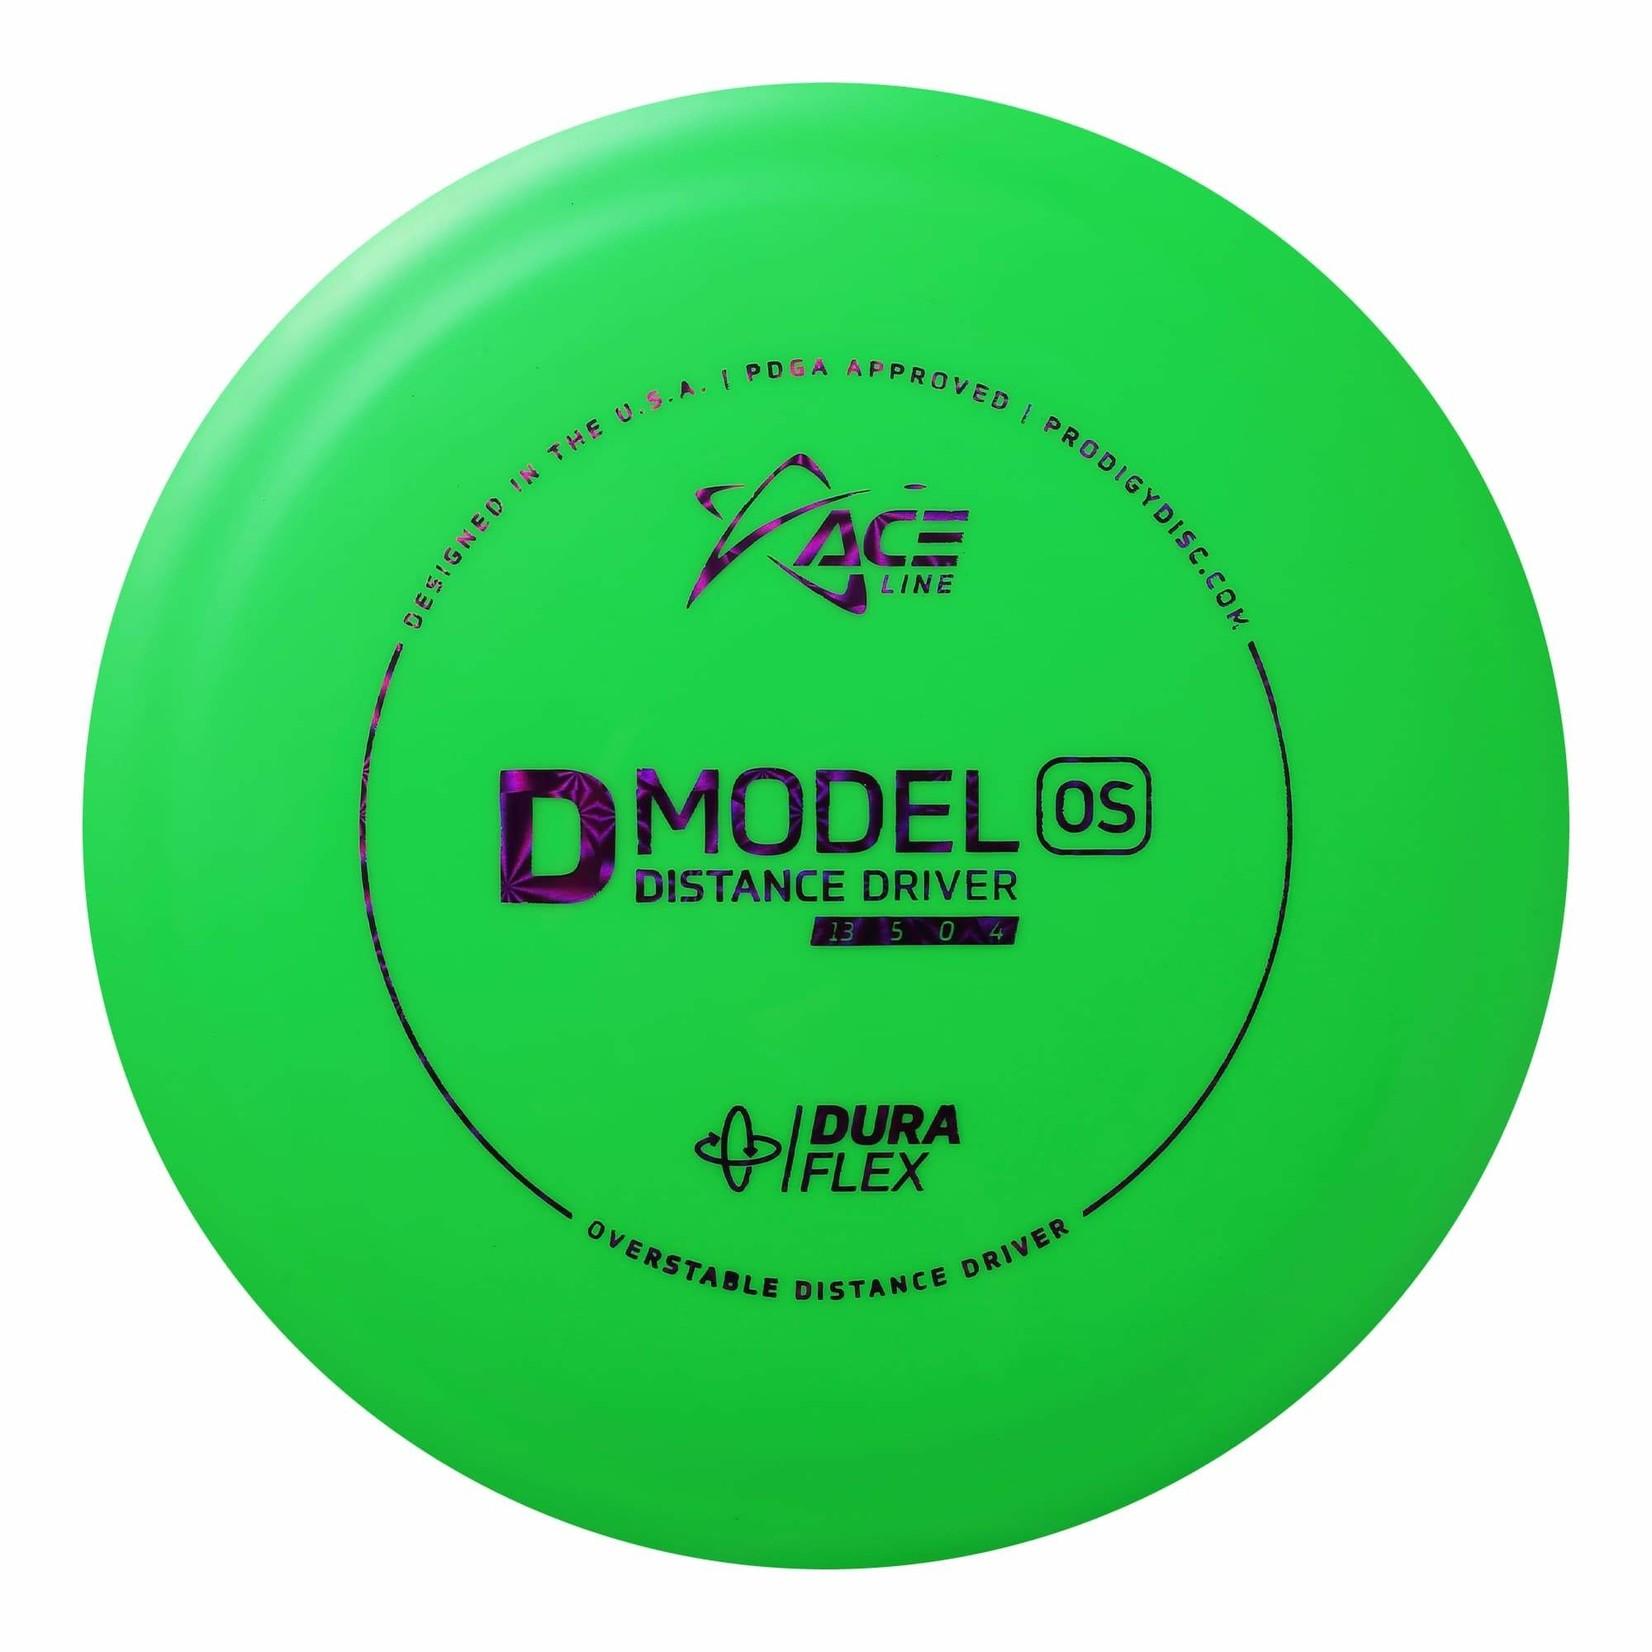 Prodigy Prodigy Disc, Ace Line Driver-OS Glow-Duraflex, ACE-D-DFgw-OS-175